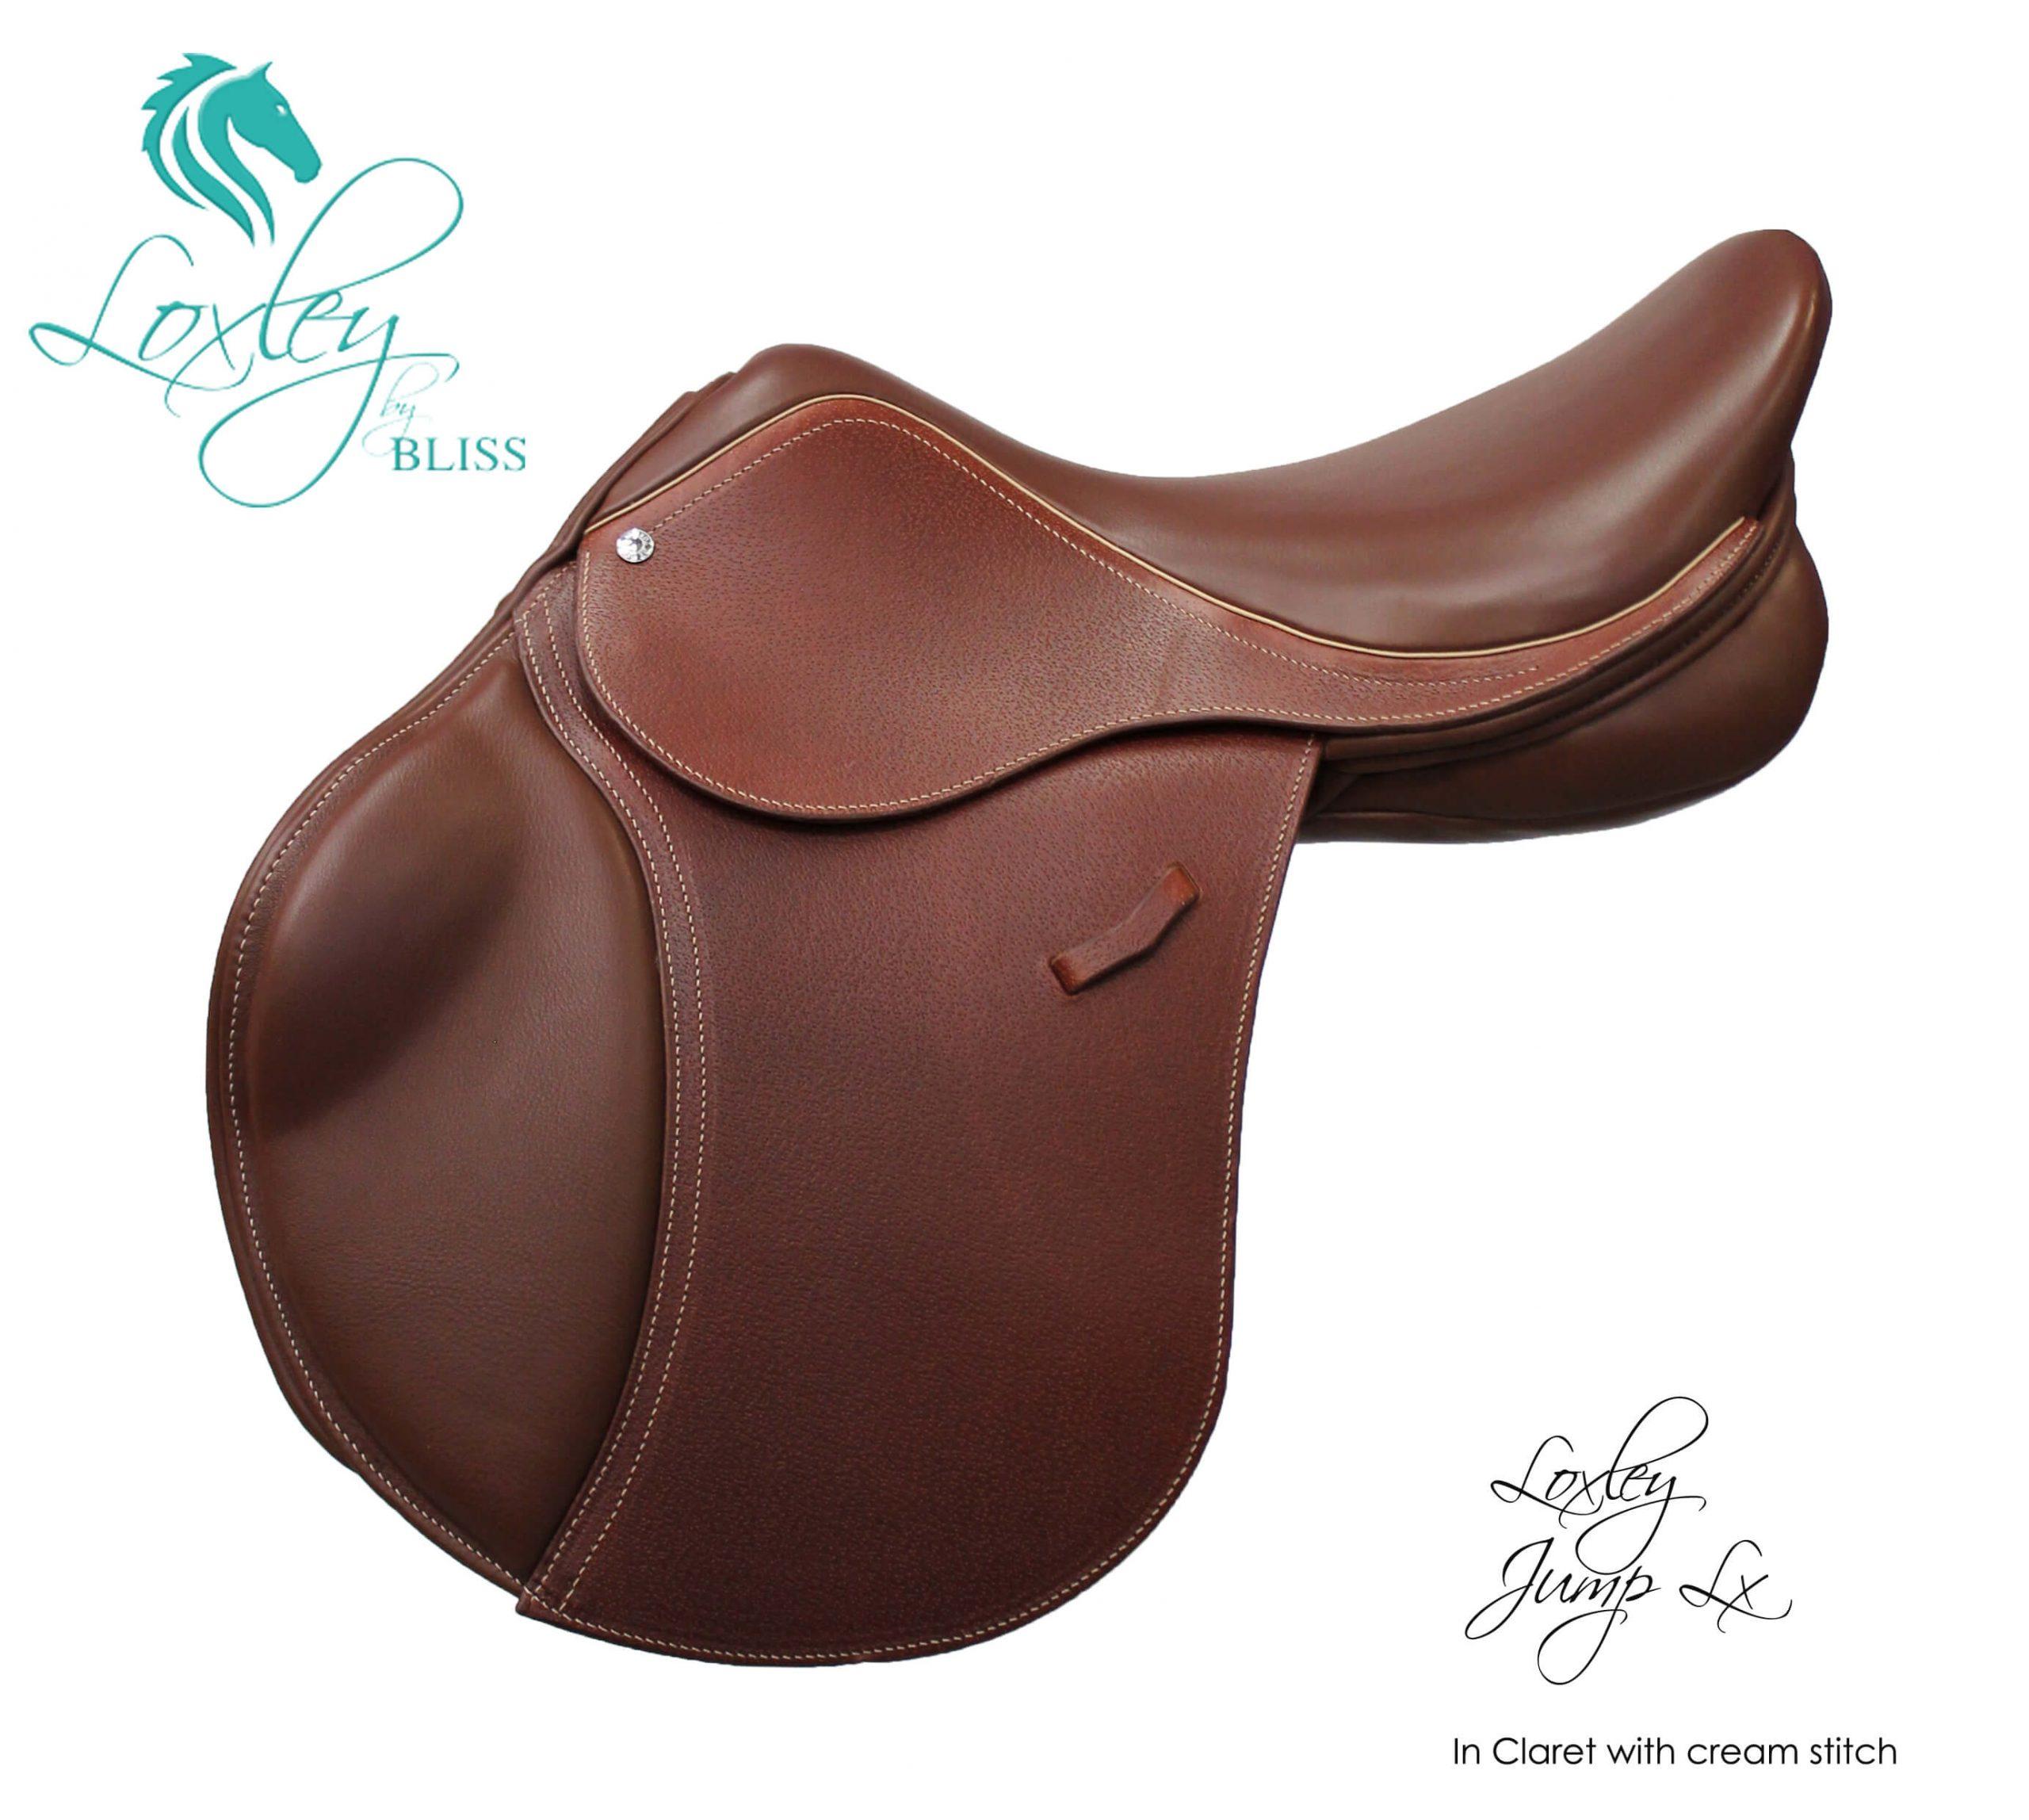 Loxley Jump LX Saddle